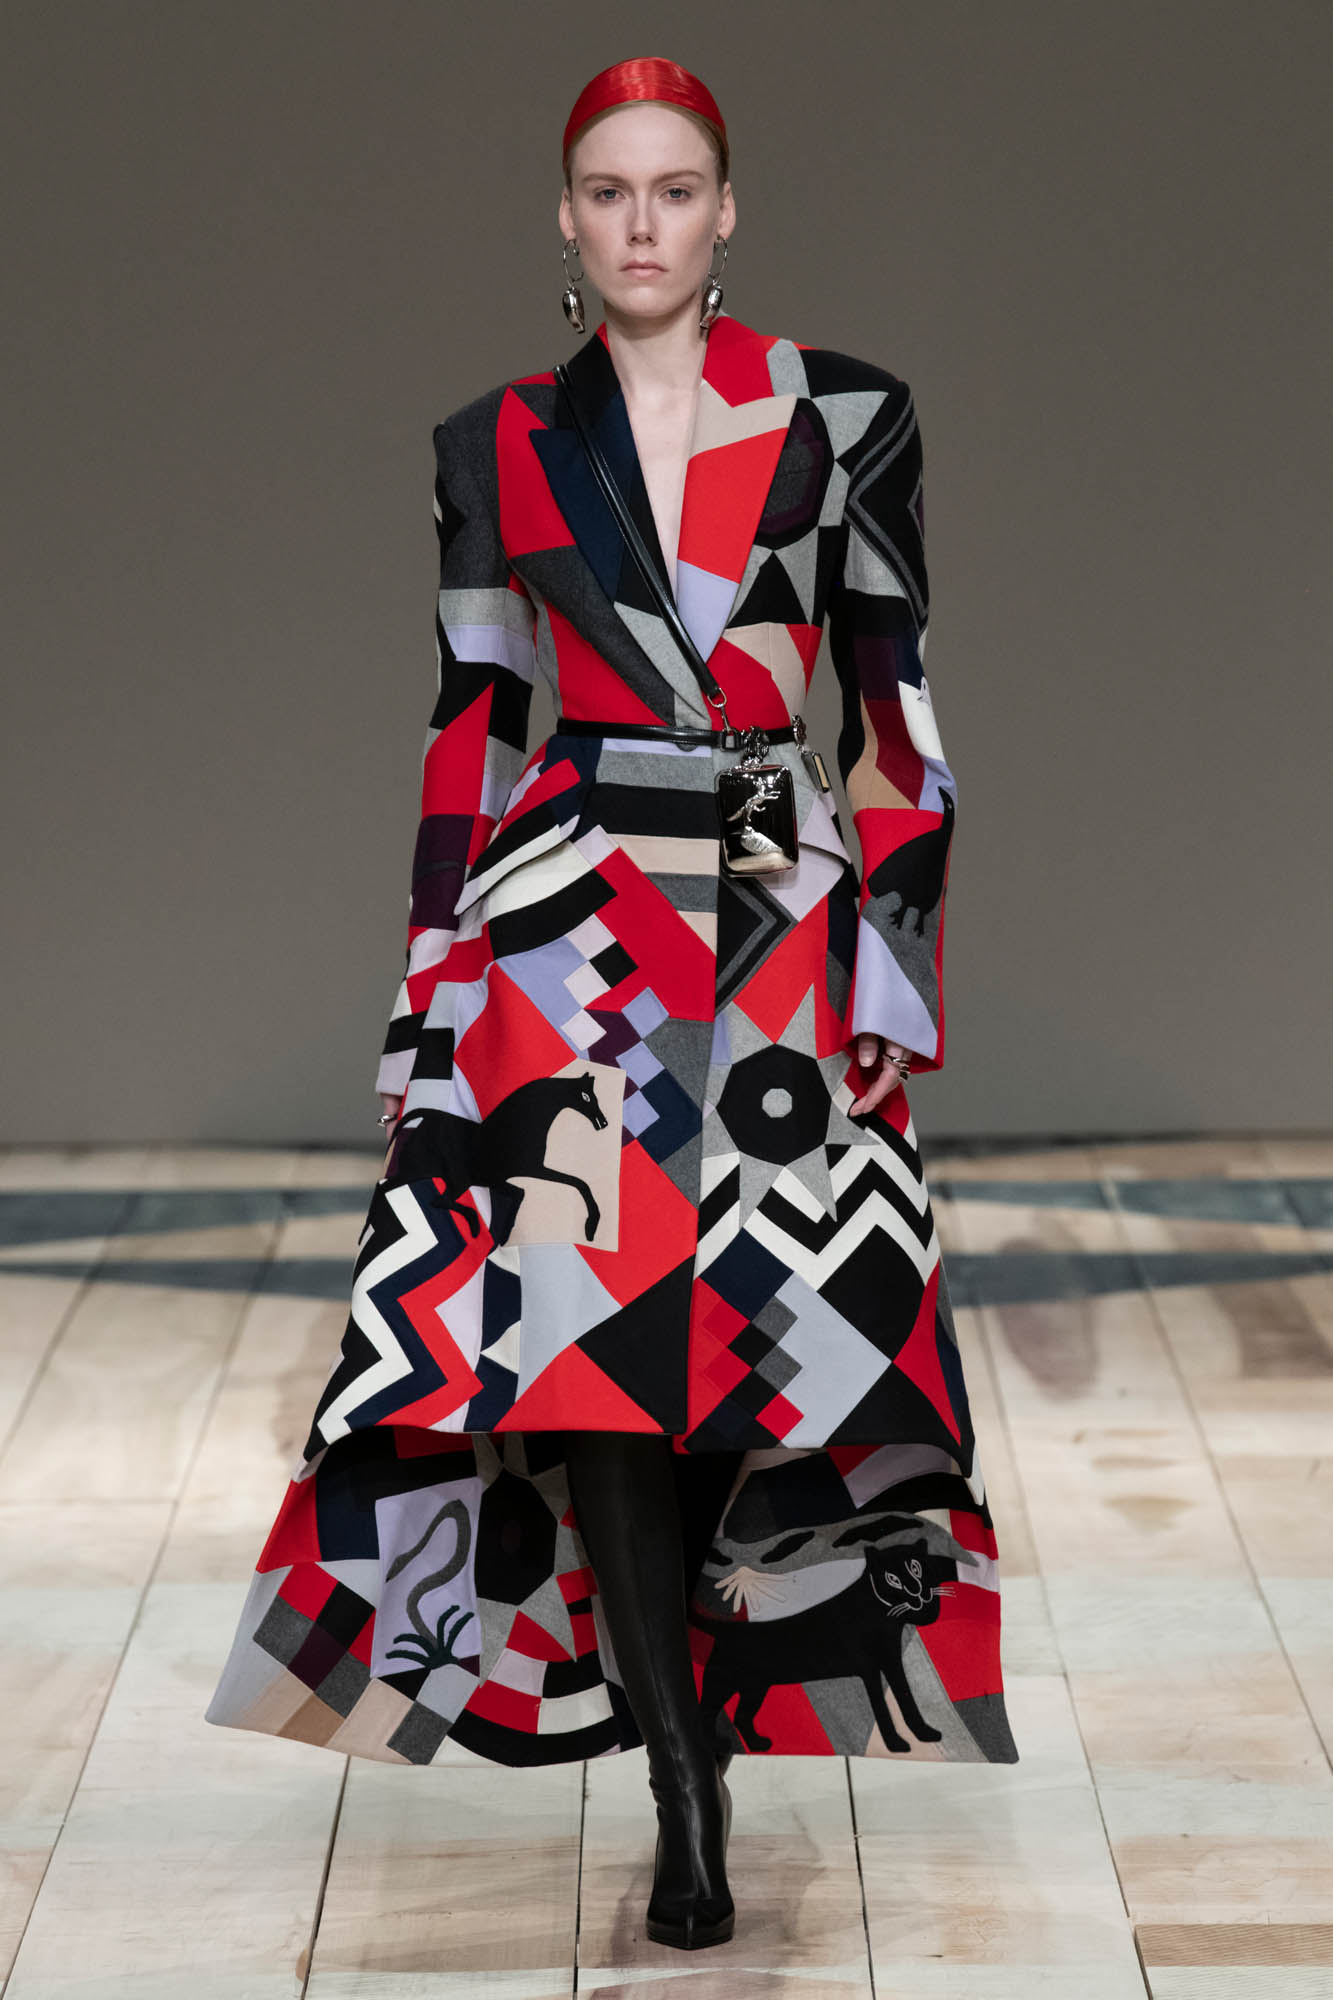 Fashion Show Woman Model Alexander McQueen Catwalk